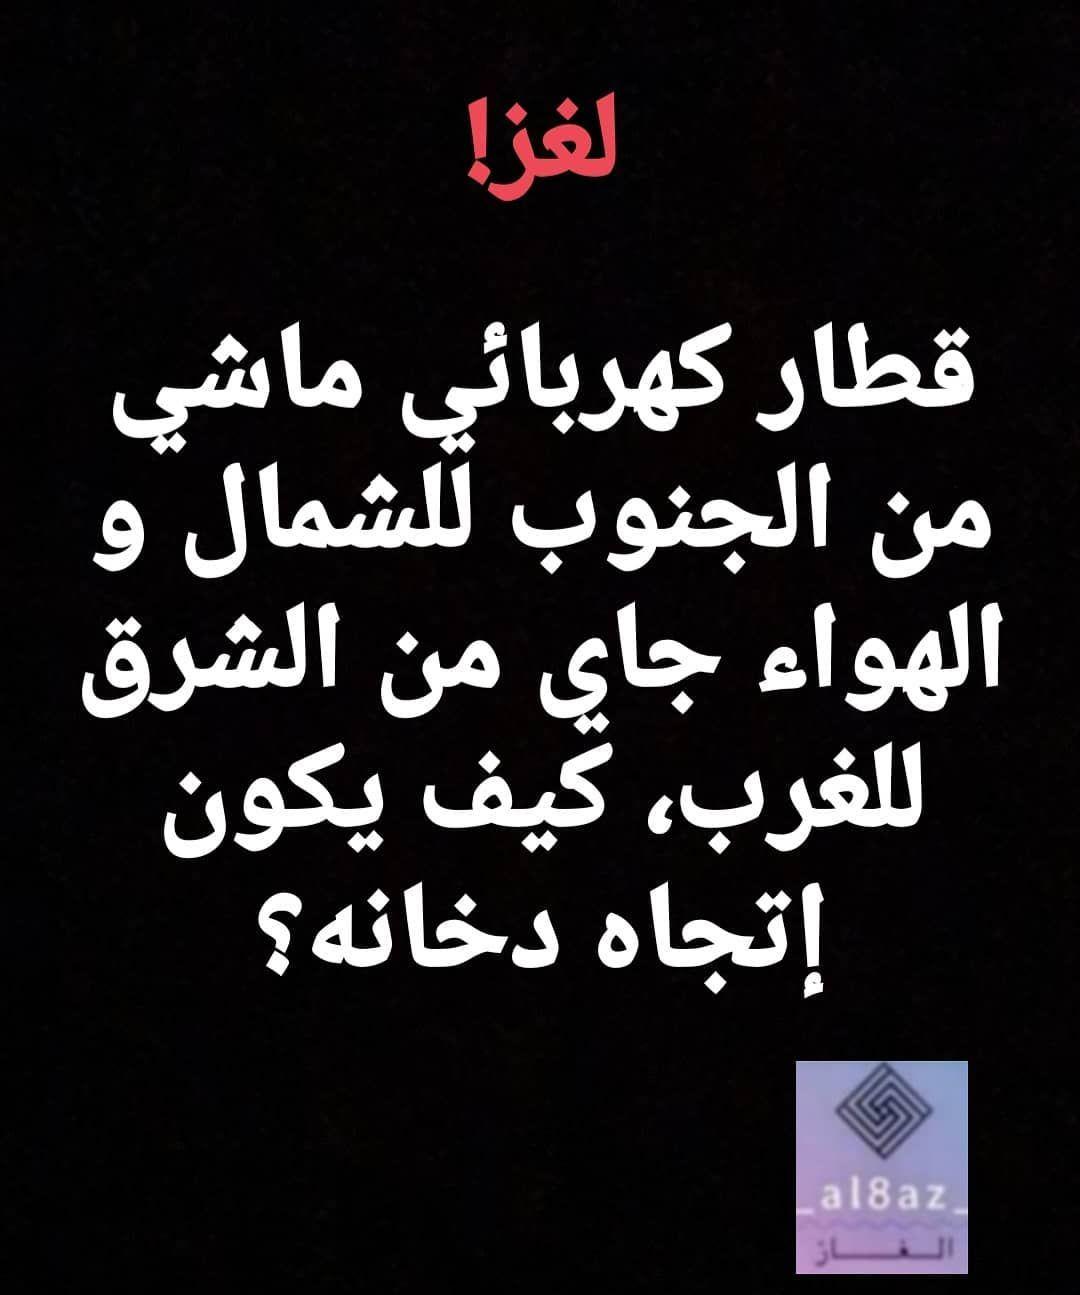 Pin By منوعات مفيدة On ألغاز Calligraphy Arabic Calligraphy